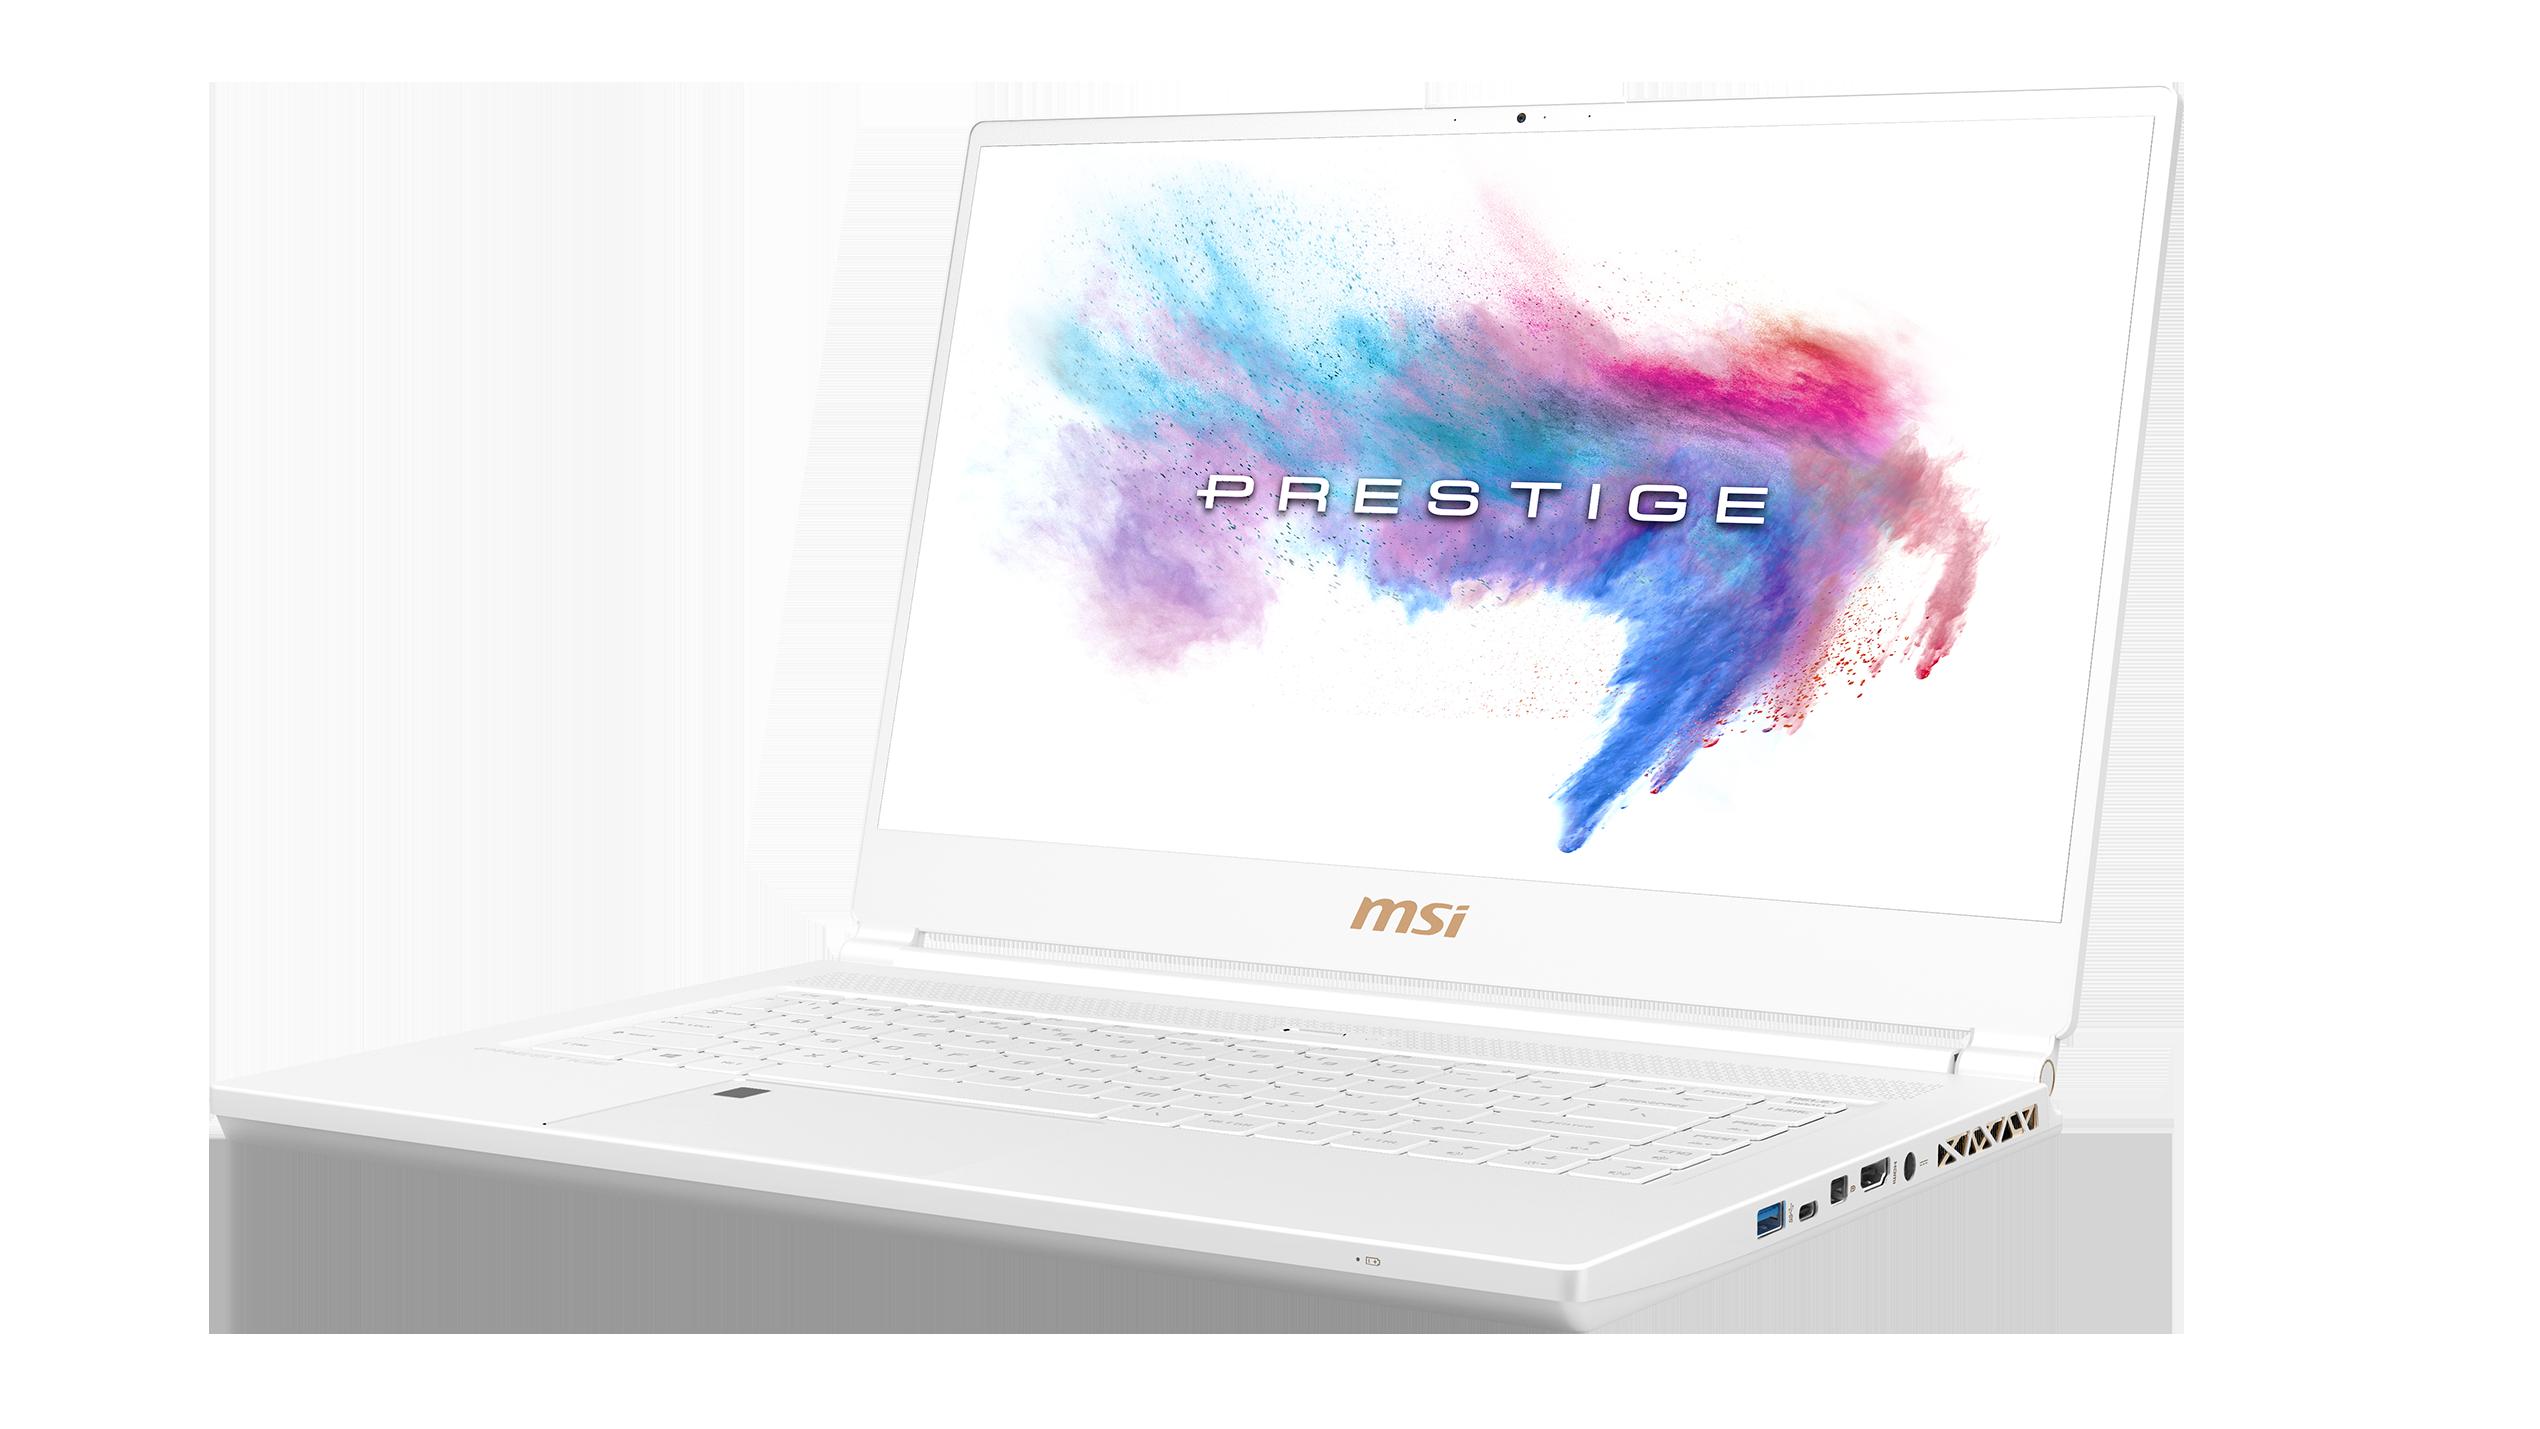 MSI P65 Creator 8RF (i7-8750H, GTX 1070 Max-Q, 512 GB SSD, 144 Hz